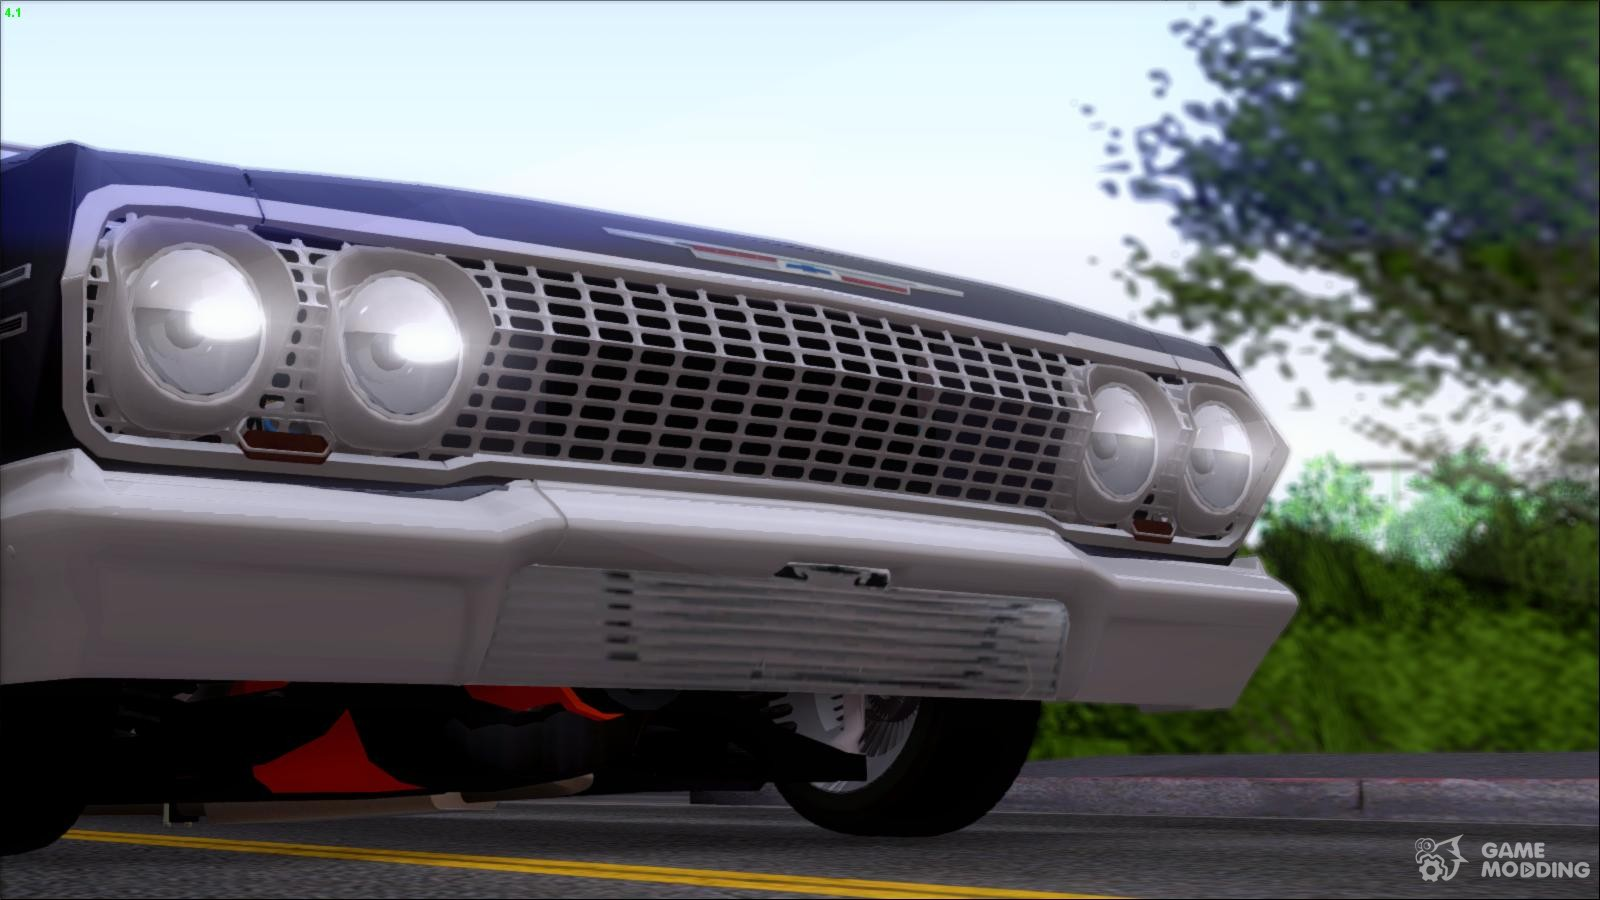 Chevrolet impala 4 door hardtop 1963 for gta san andreas - Chevrolet Impala 1963 For Gta San Andreas Rear Left View